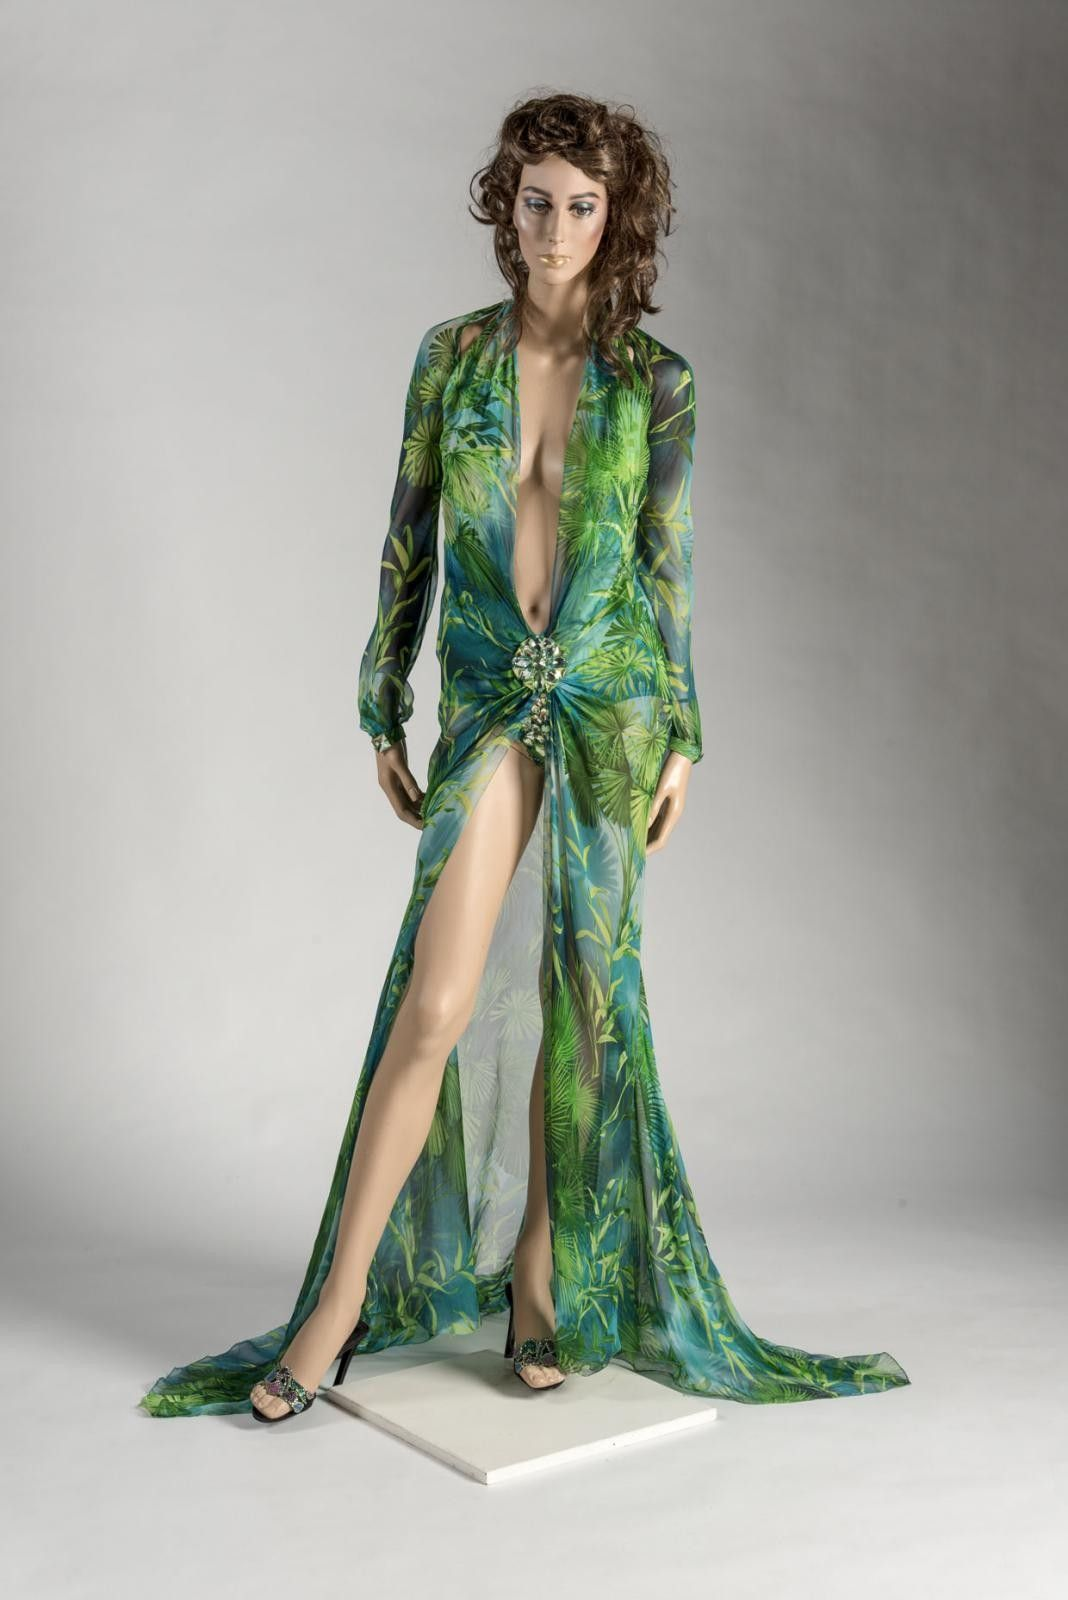 2000 Donatella Versace Versace Fashion Grammy Dresses Jlo Green Dress [ 1600 x 1068 Pixel ]